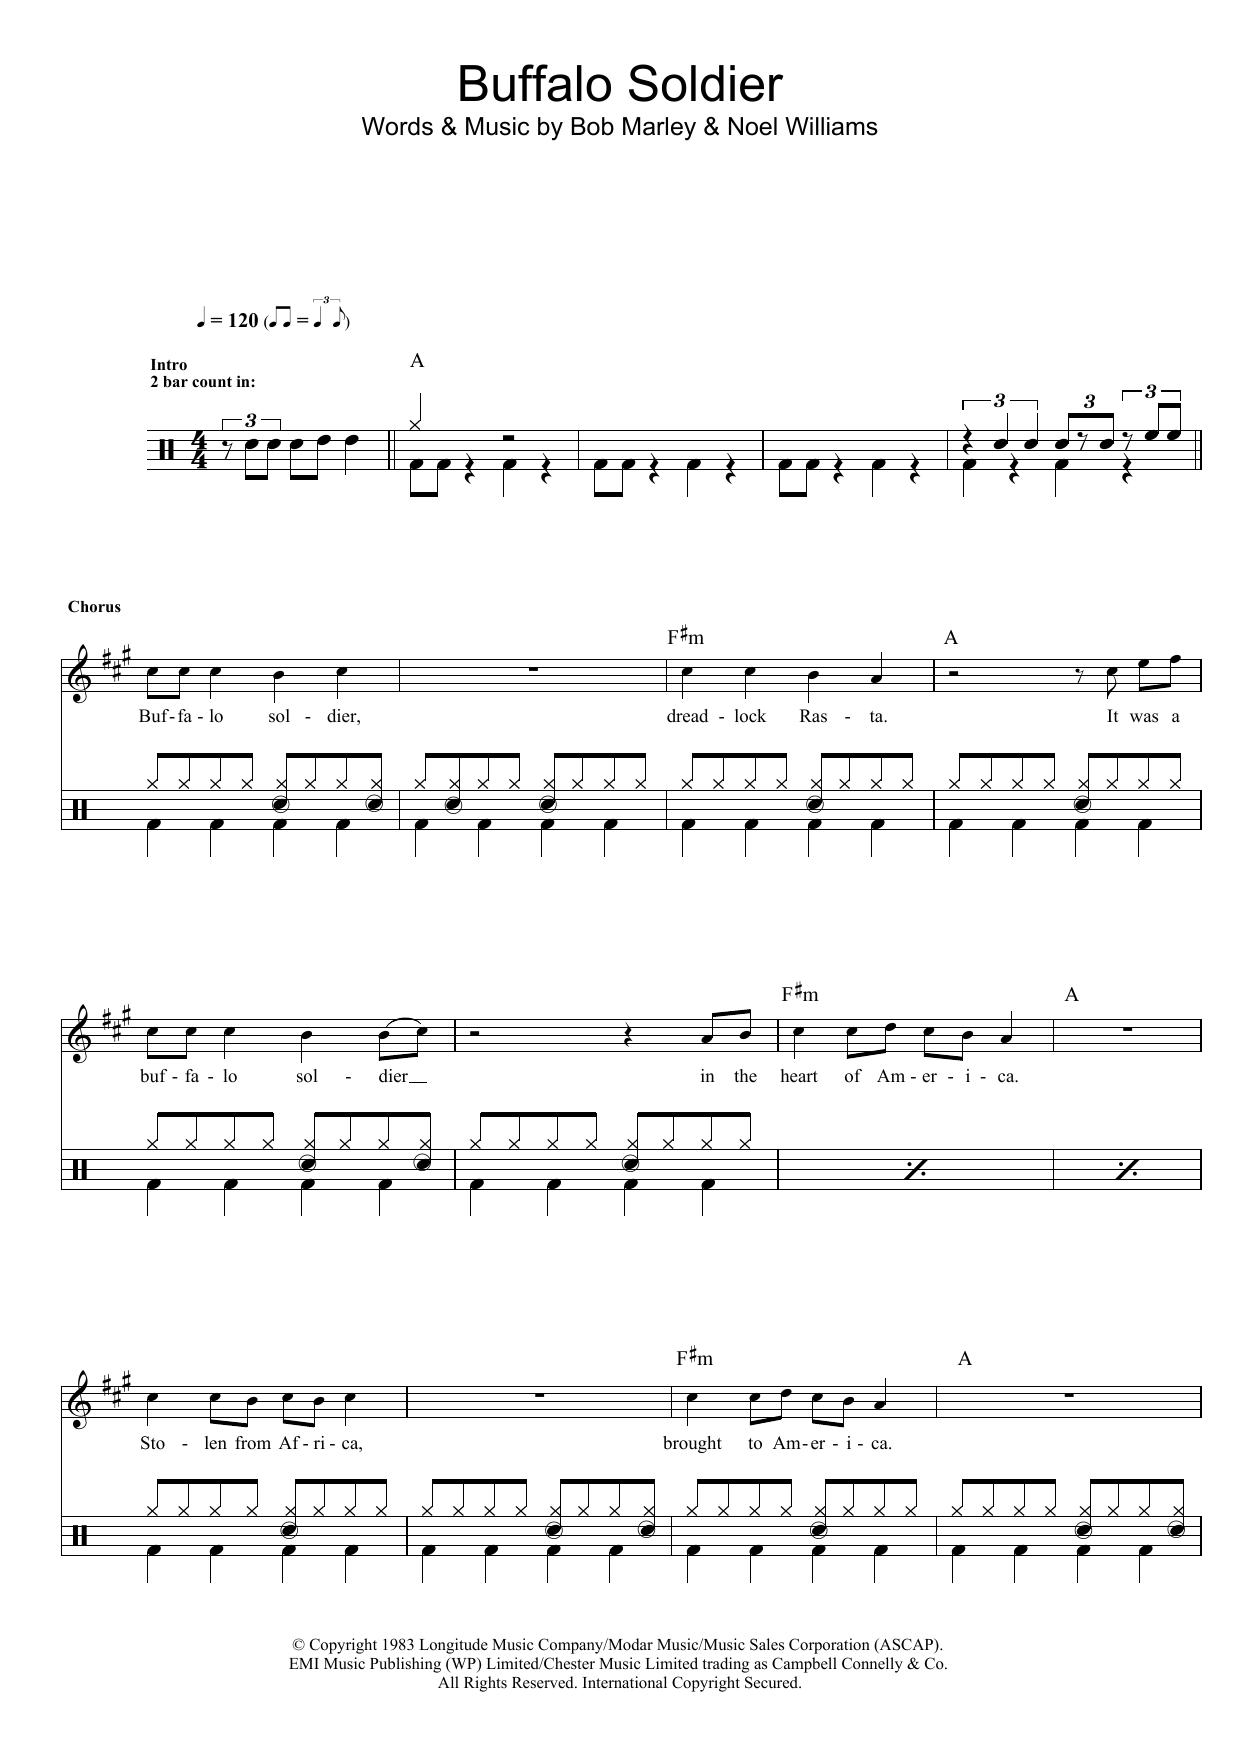 Buffalo Soldier Sheet Music